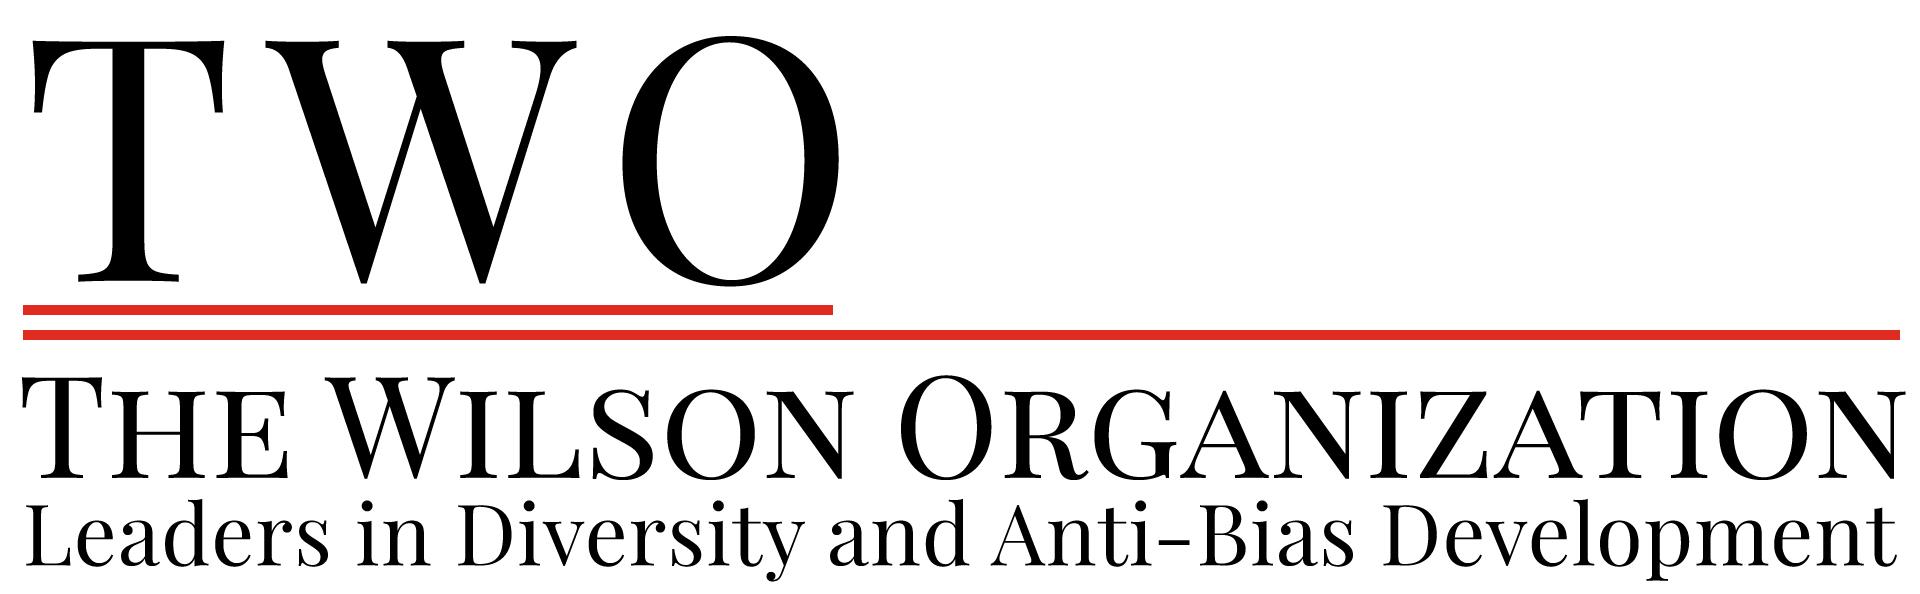 The Wilson Organization